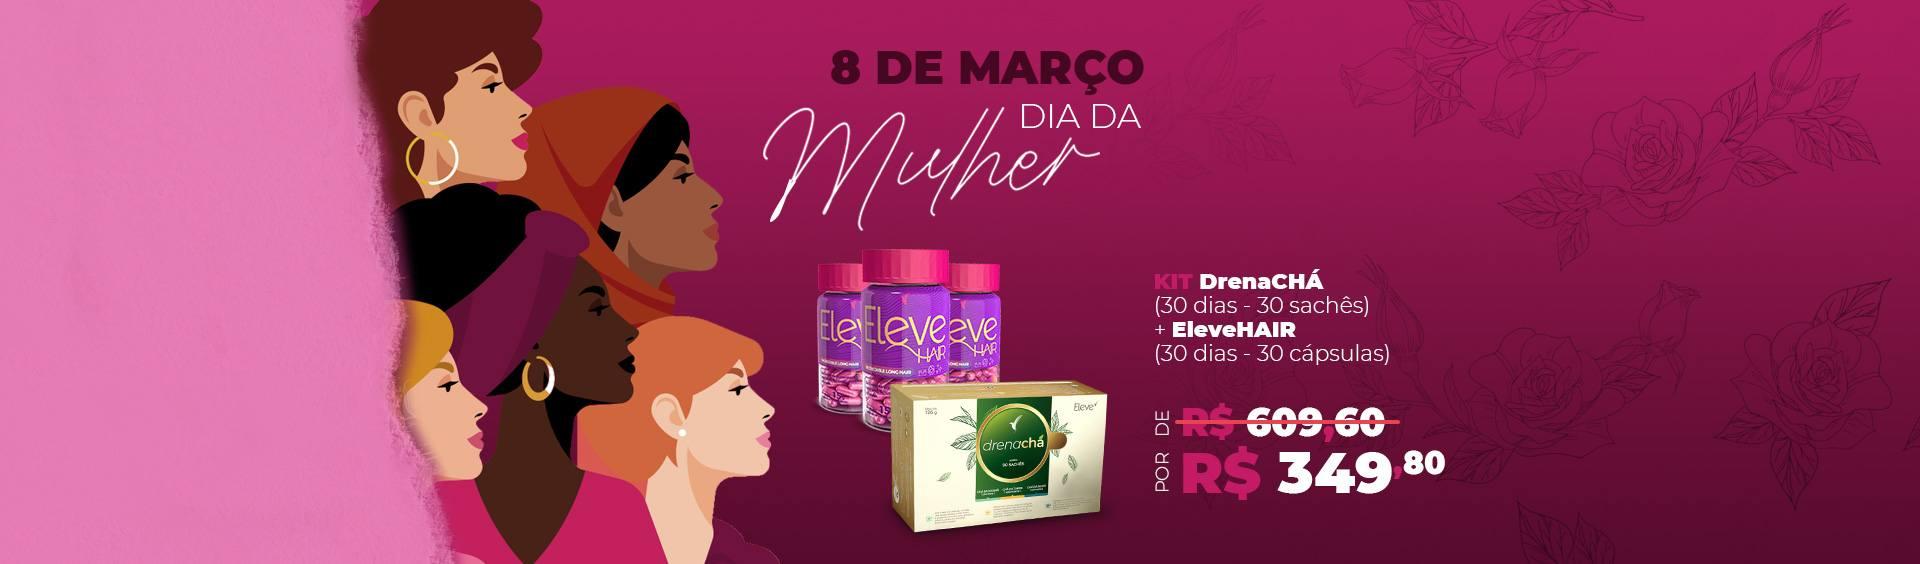 Banner_Dia-da-Mulher--KIT-Drenacha+HAIR-(Desktop)